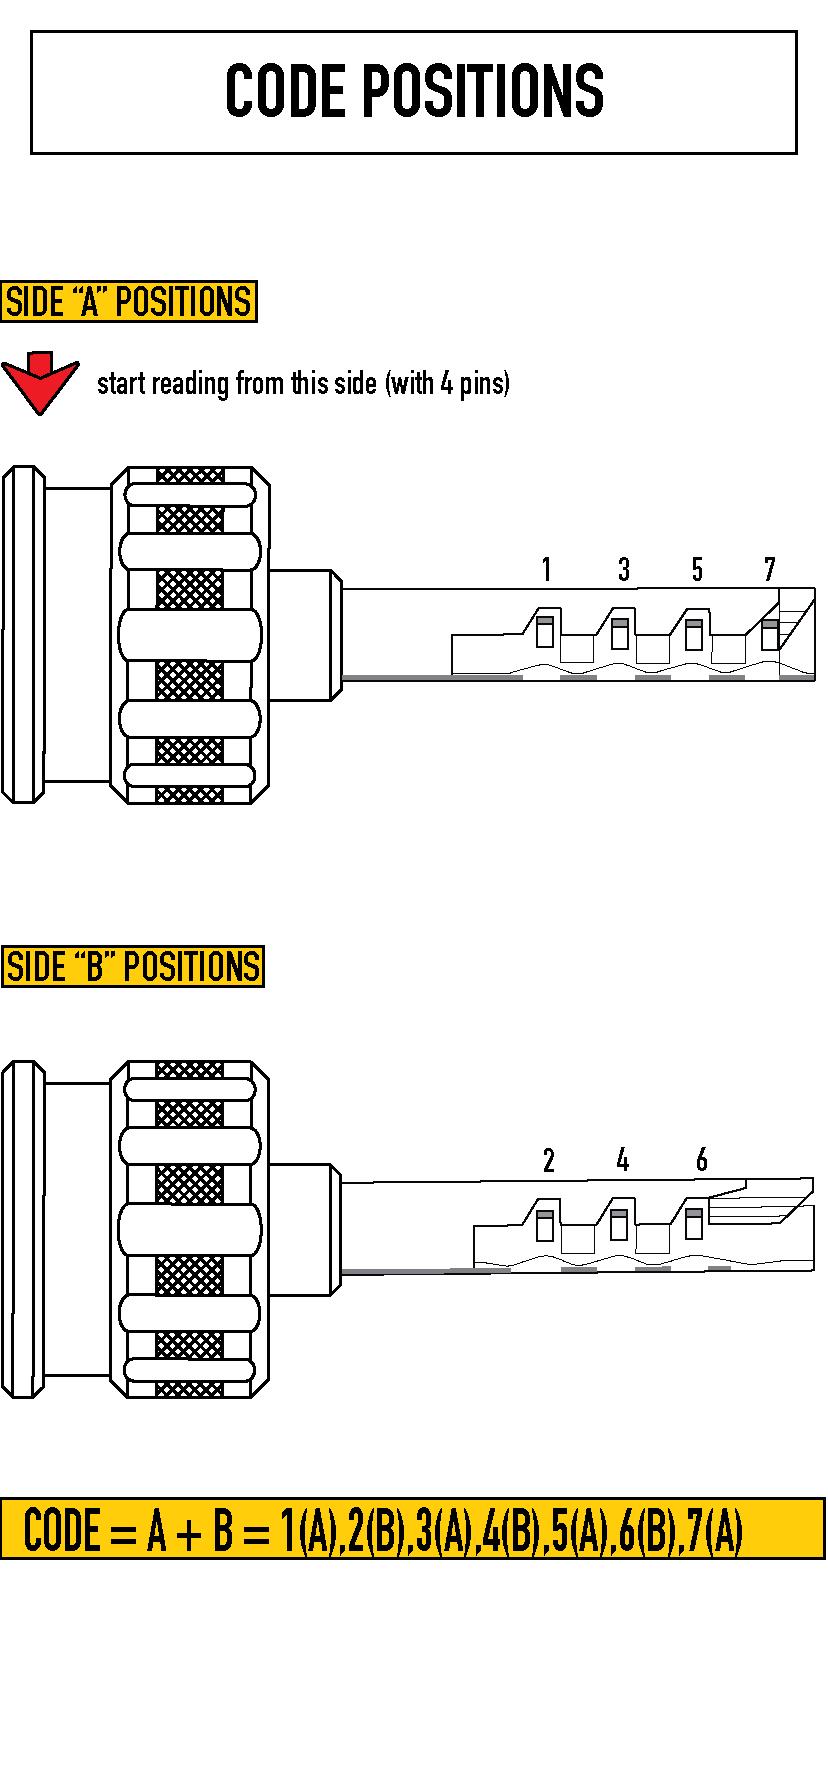 Prodecoder HU84 DAF trucks